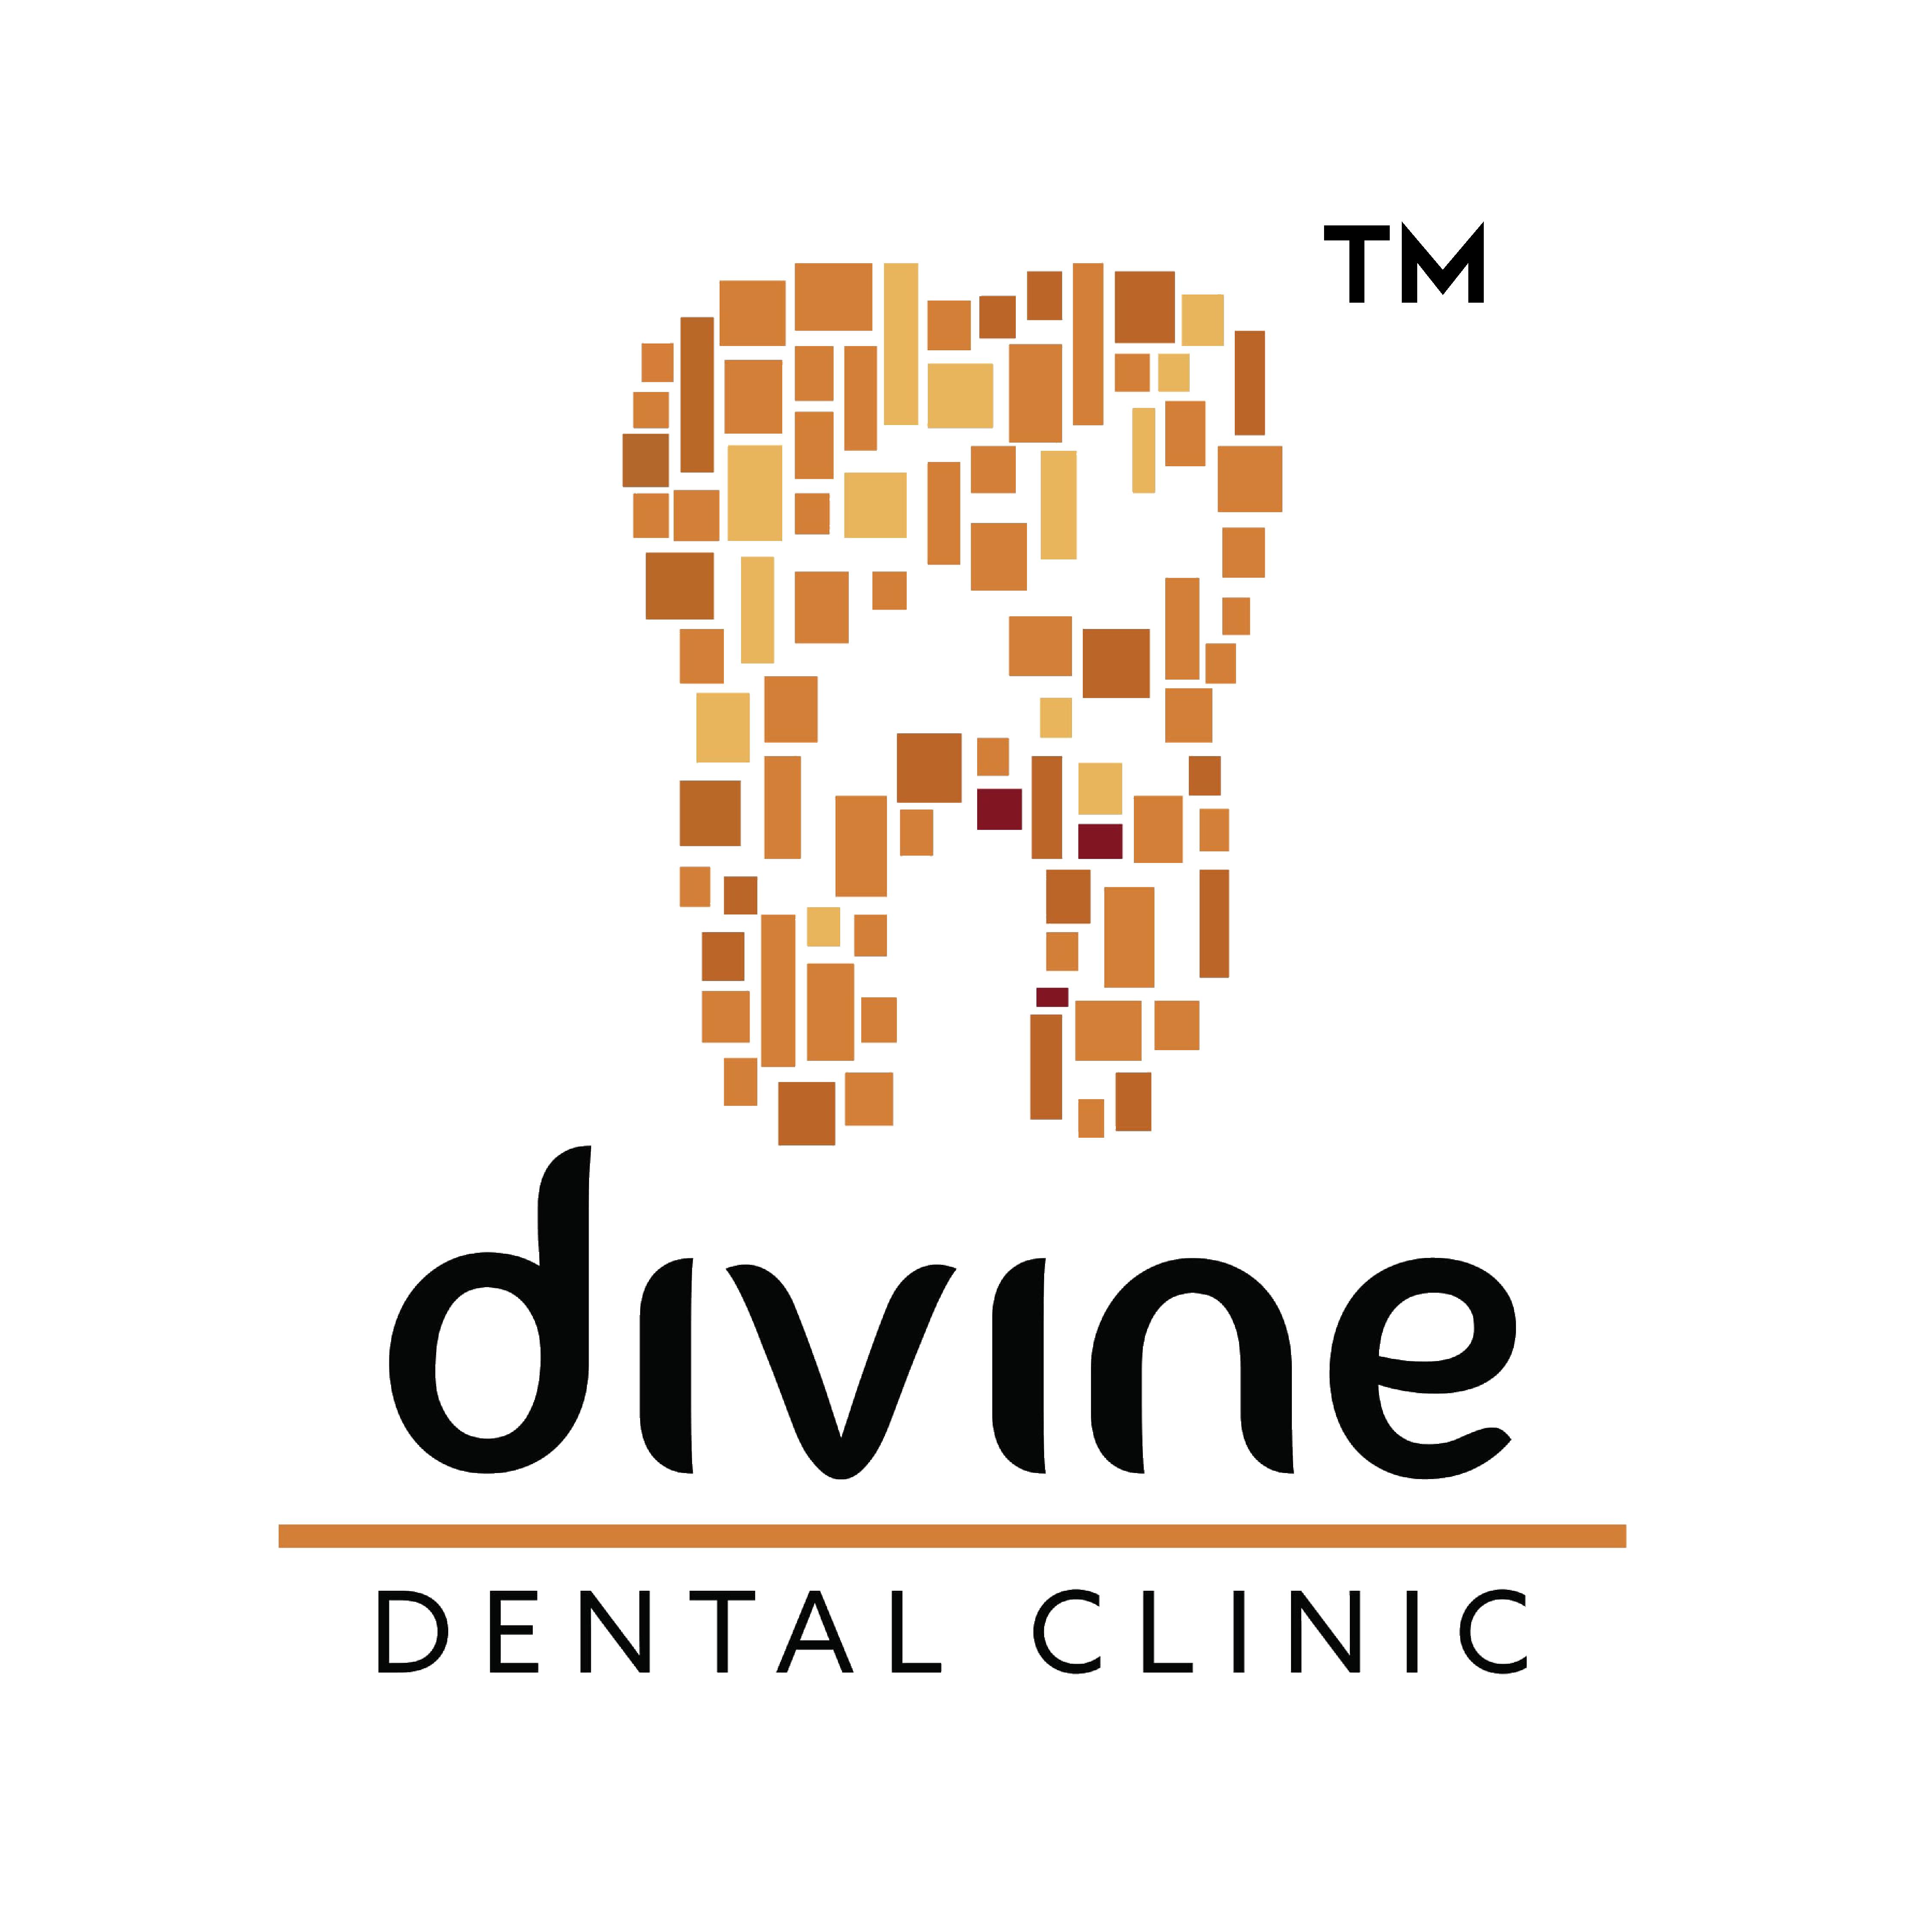 - Divine Dental Clinic